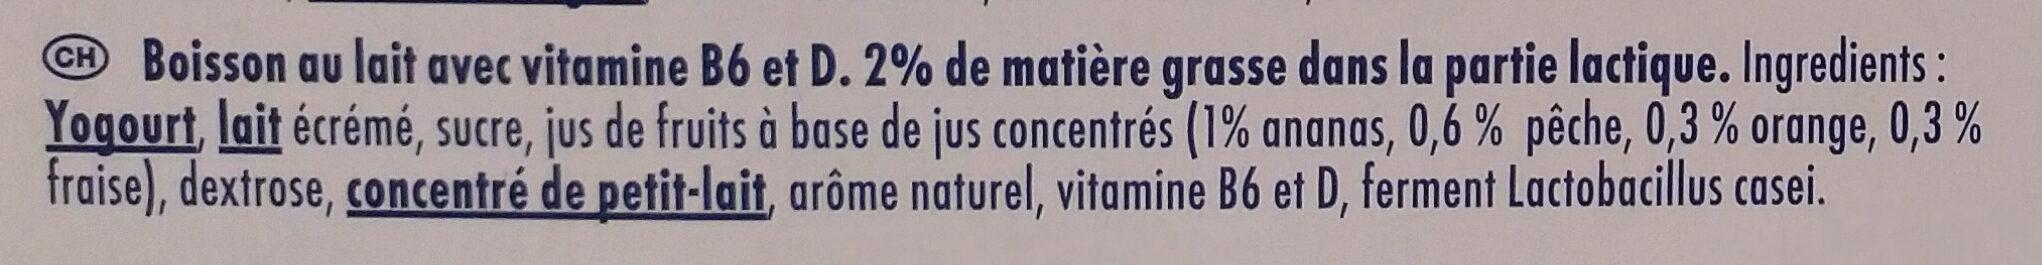 Actimel Multifrucht - Ingrédients - fr